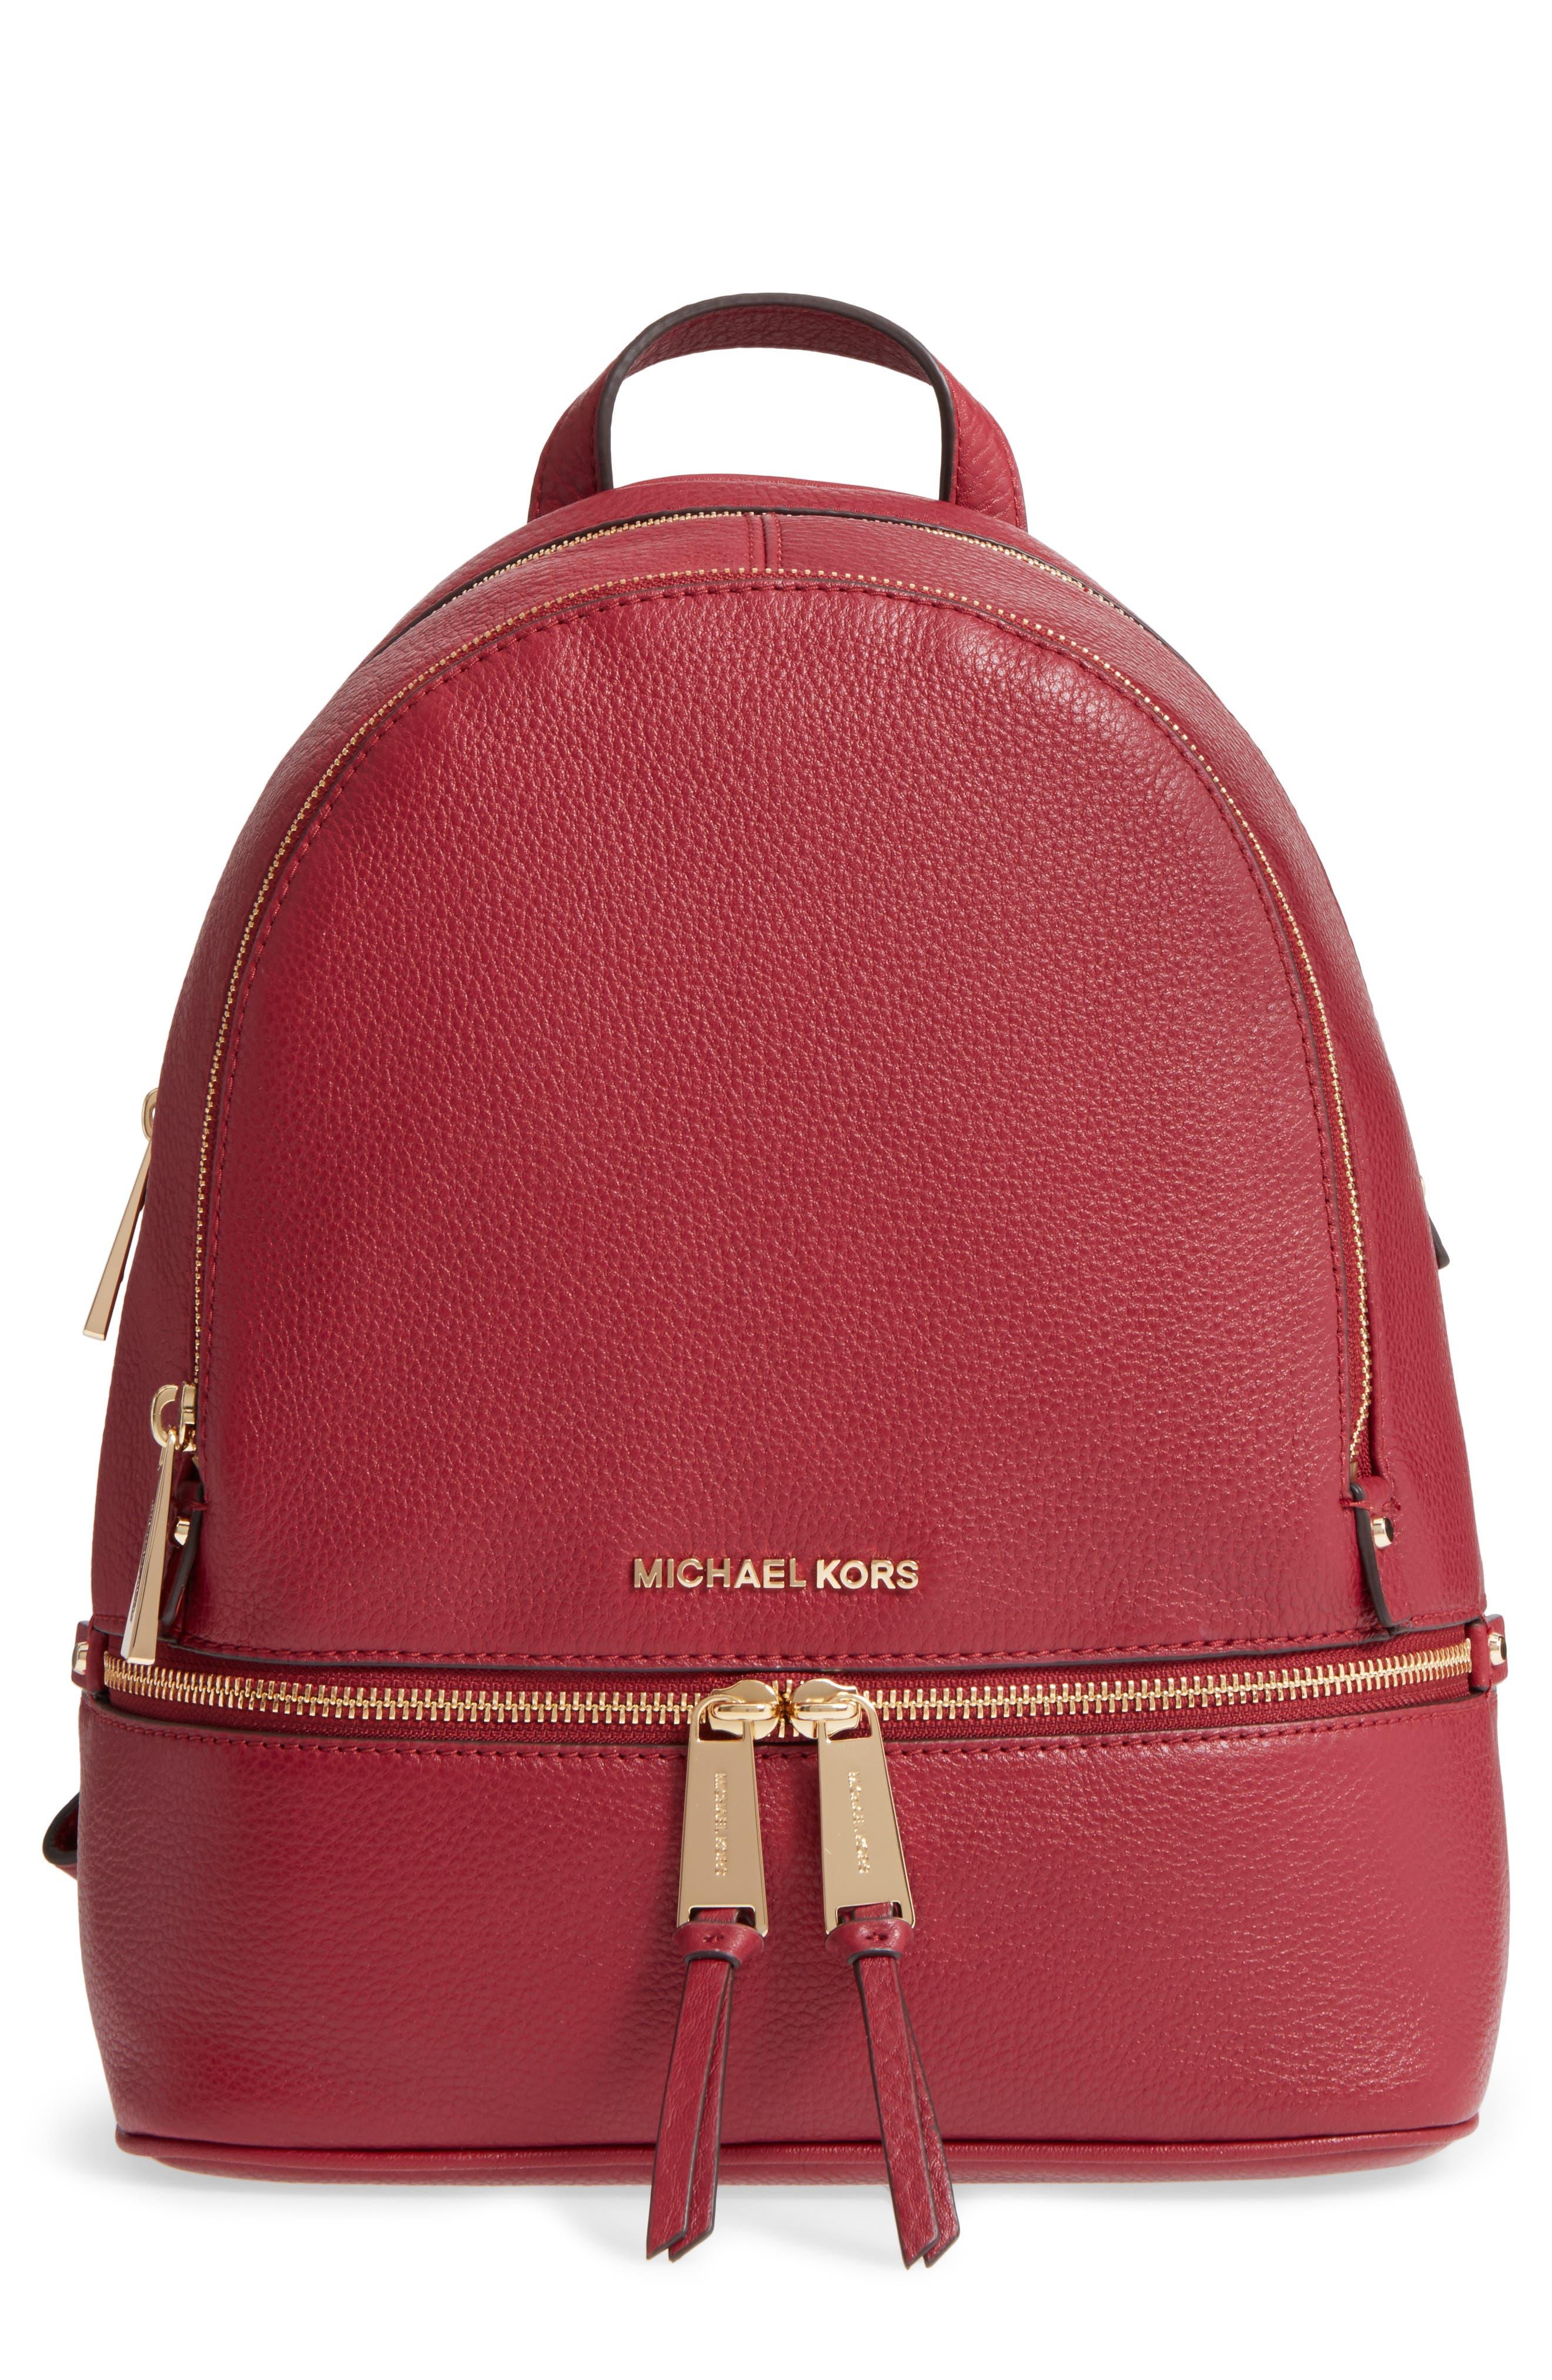 MICHAEL Michael Kors 'Extra Small Rhea Zip' Leather Backpack